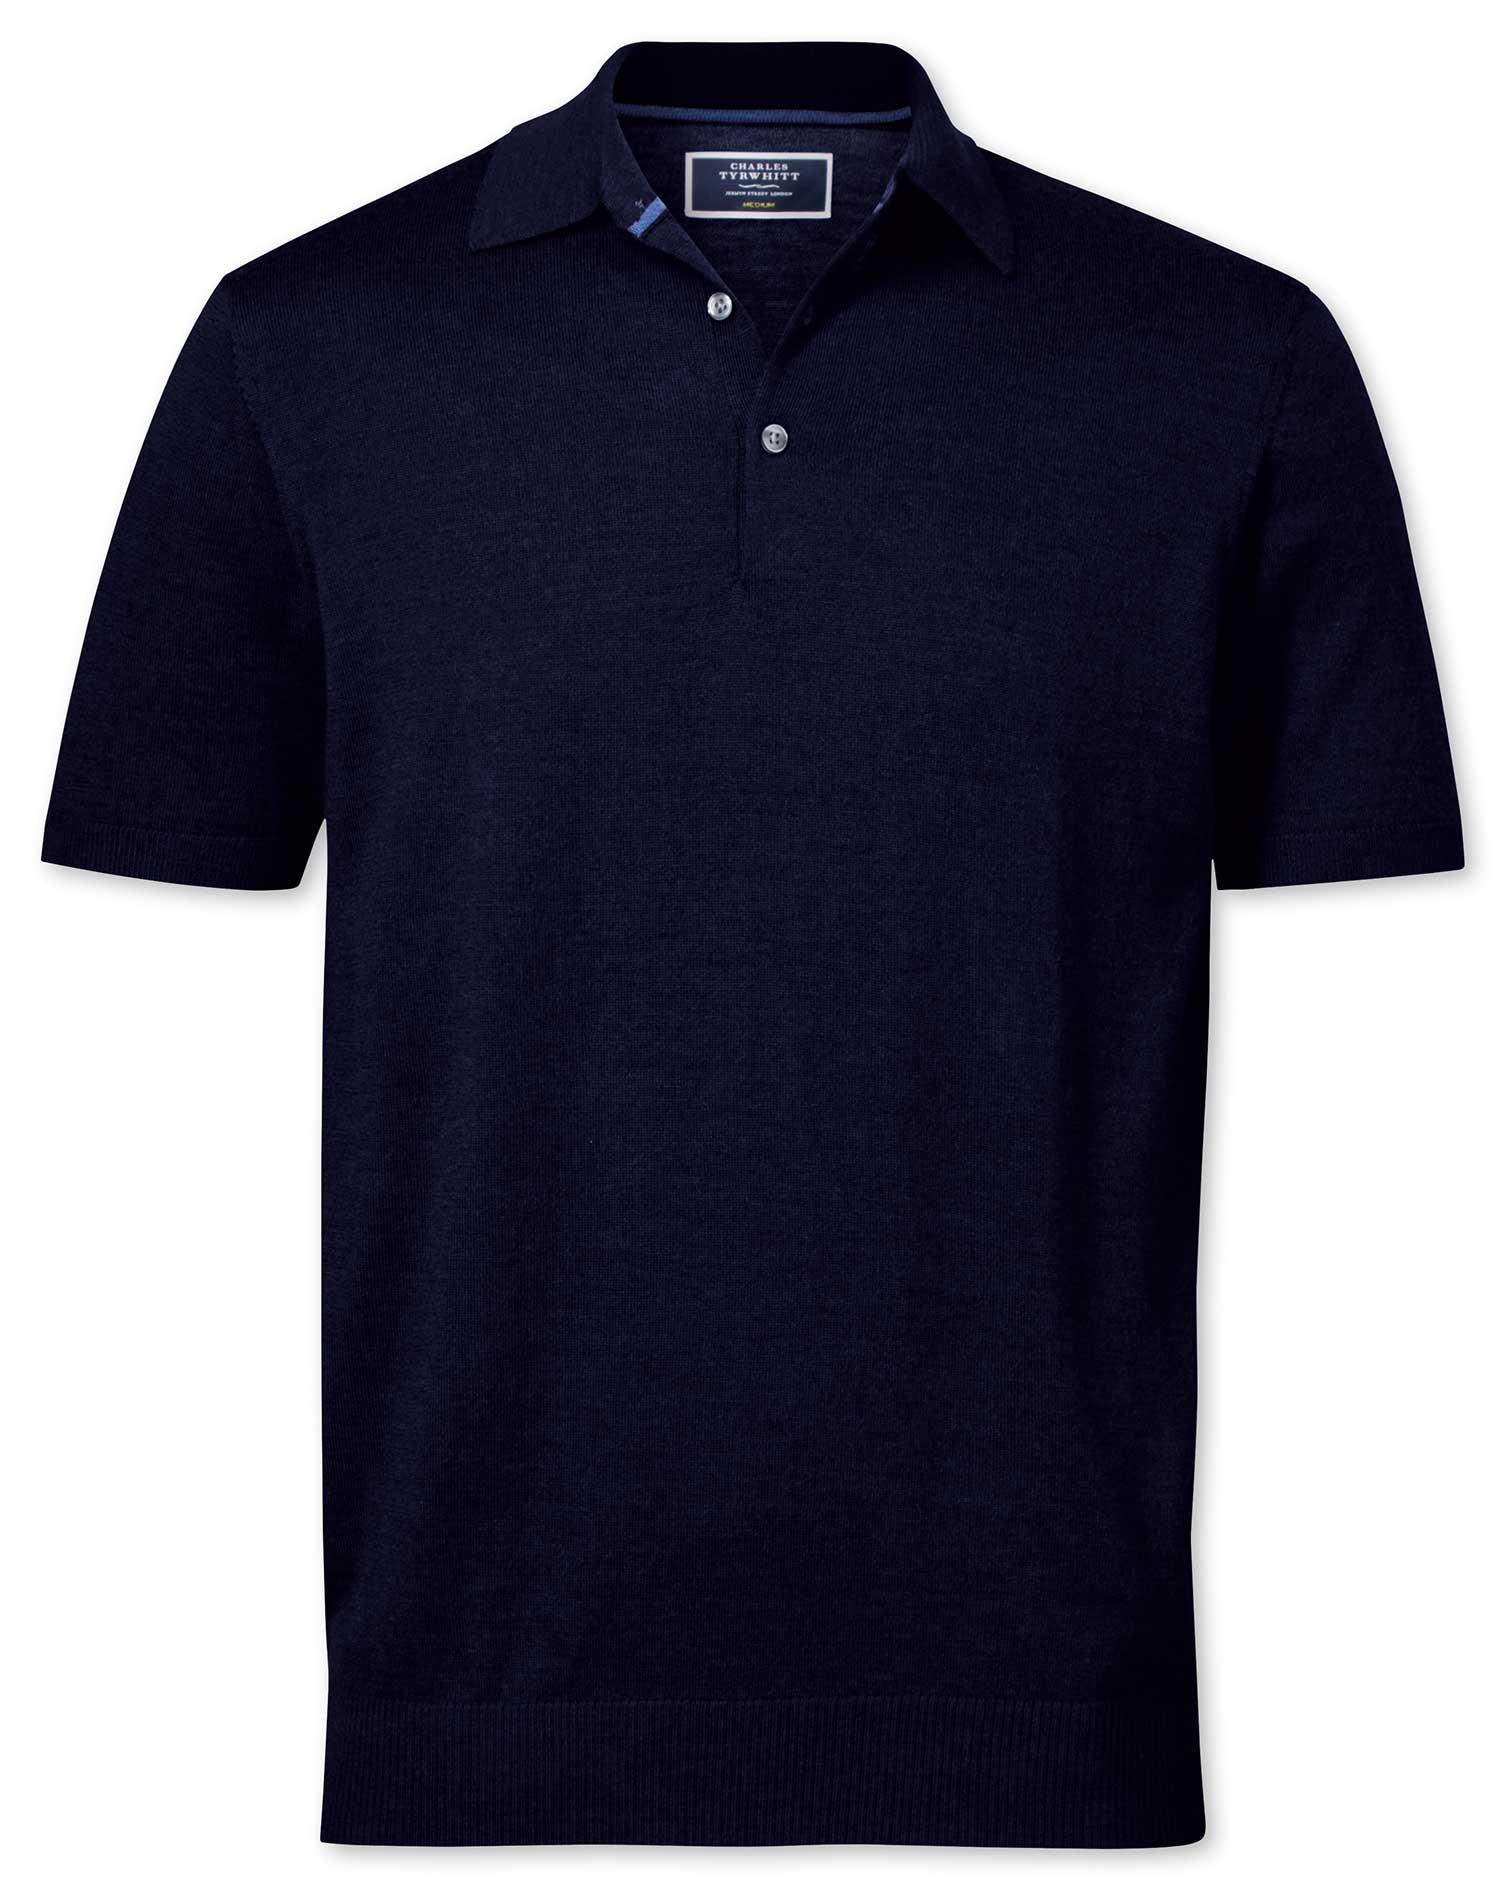 Navy Merino Wool Polo Collar Short Sleeve Jumper Size Large by Charles Tyrwhitt